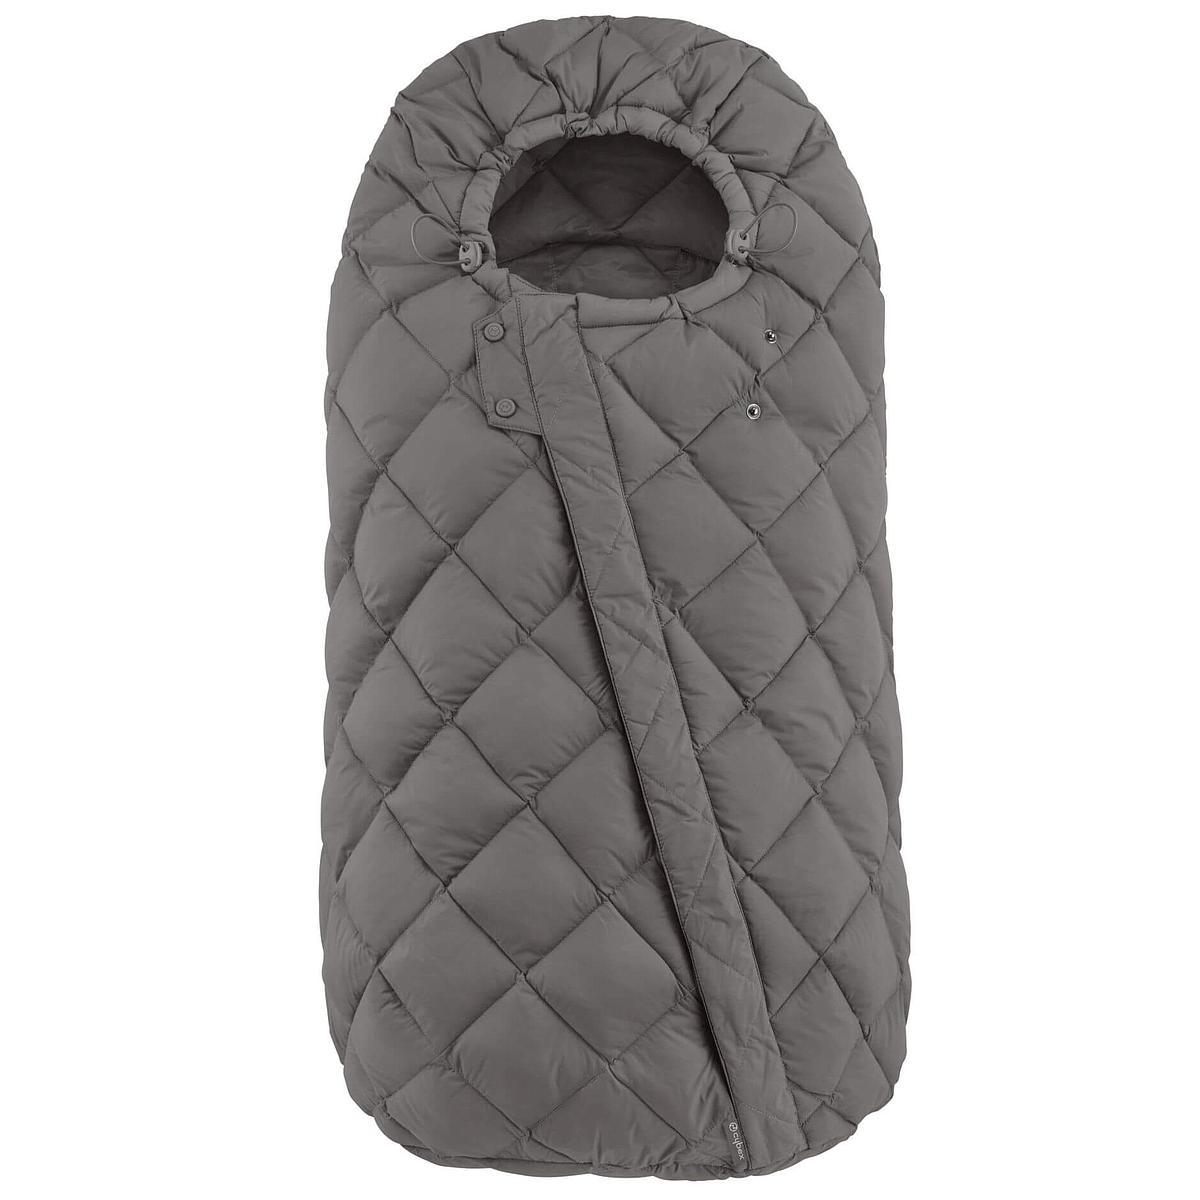 Saco silla bebé SNOGGA Cybex Soho Grey - mid grey